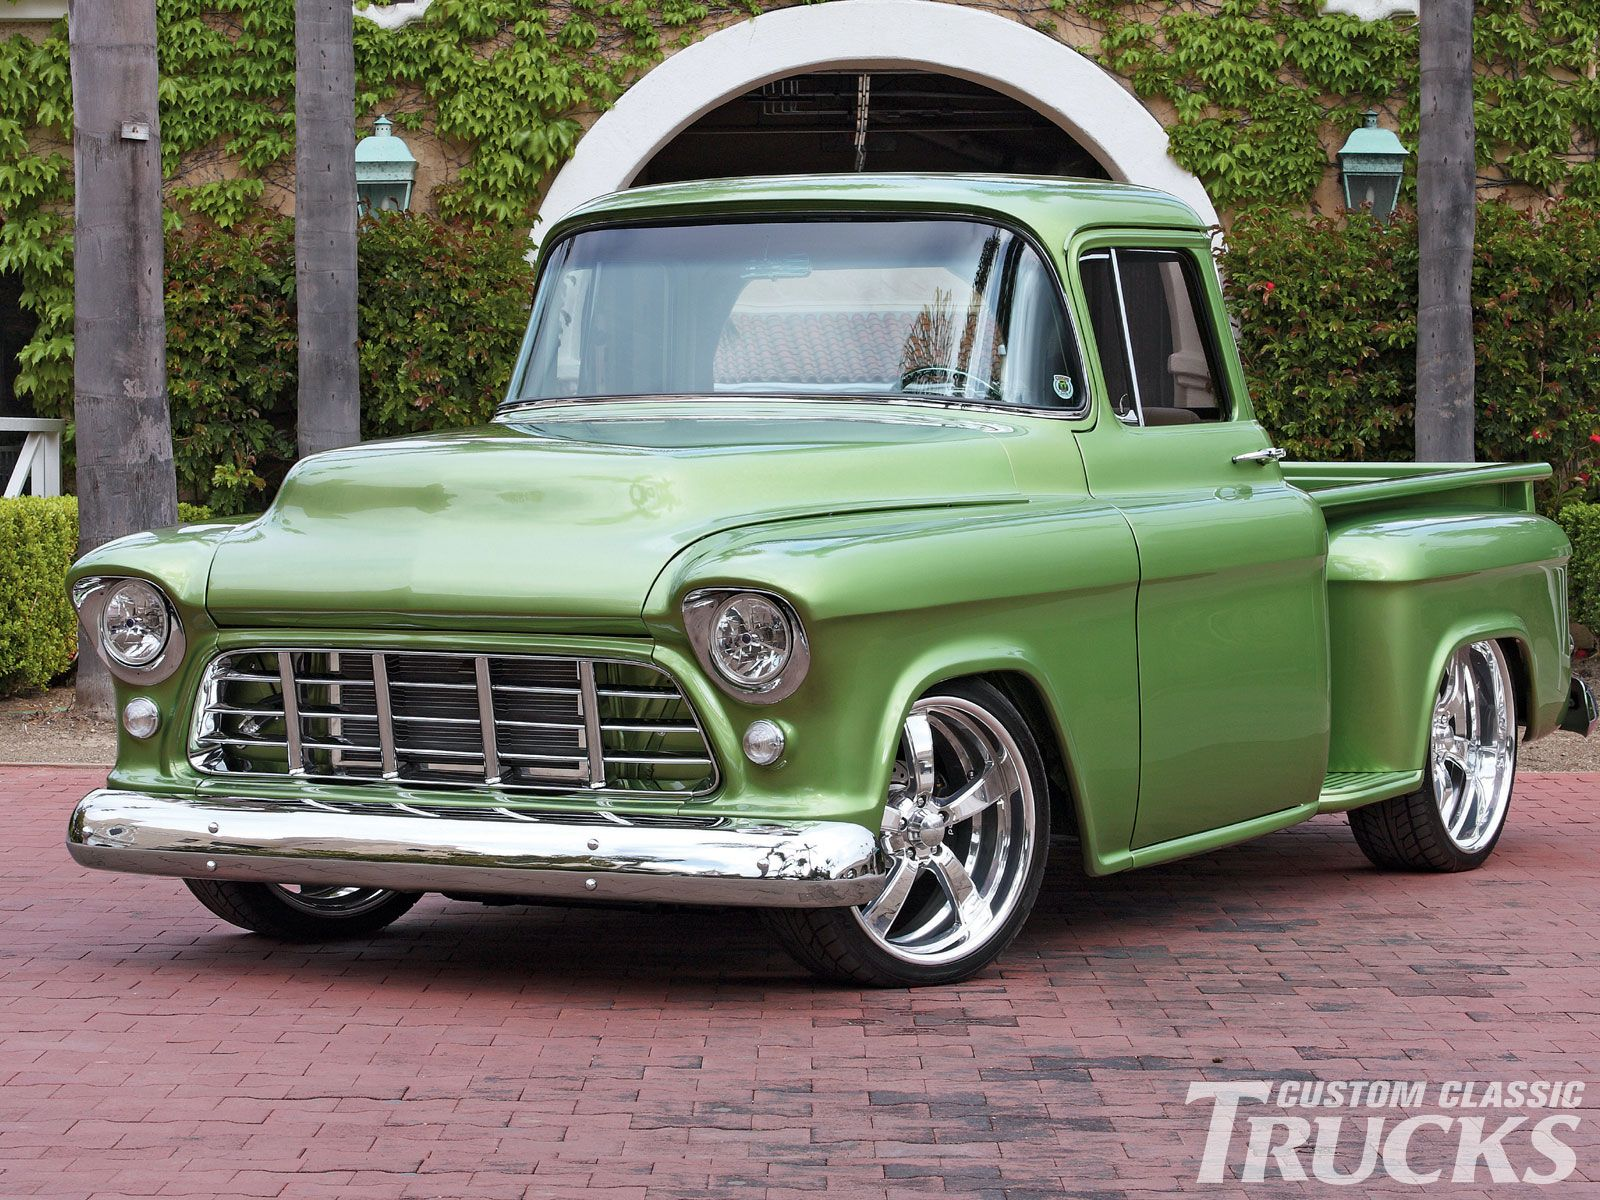 1957 chevy trucks for sale 1956 chevrolet truck front color ideas pinterest chevrolet. Black Bedroom Furniture Sets. Home Design Ideas